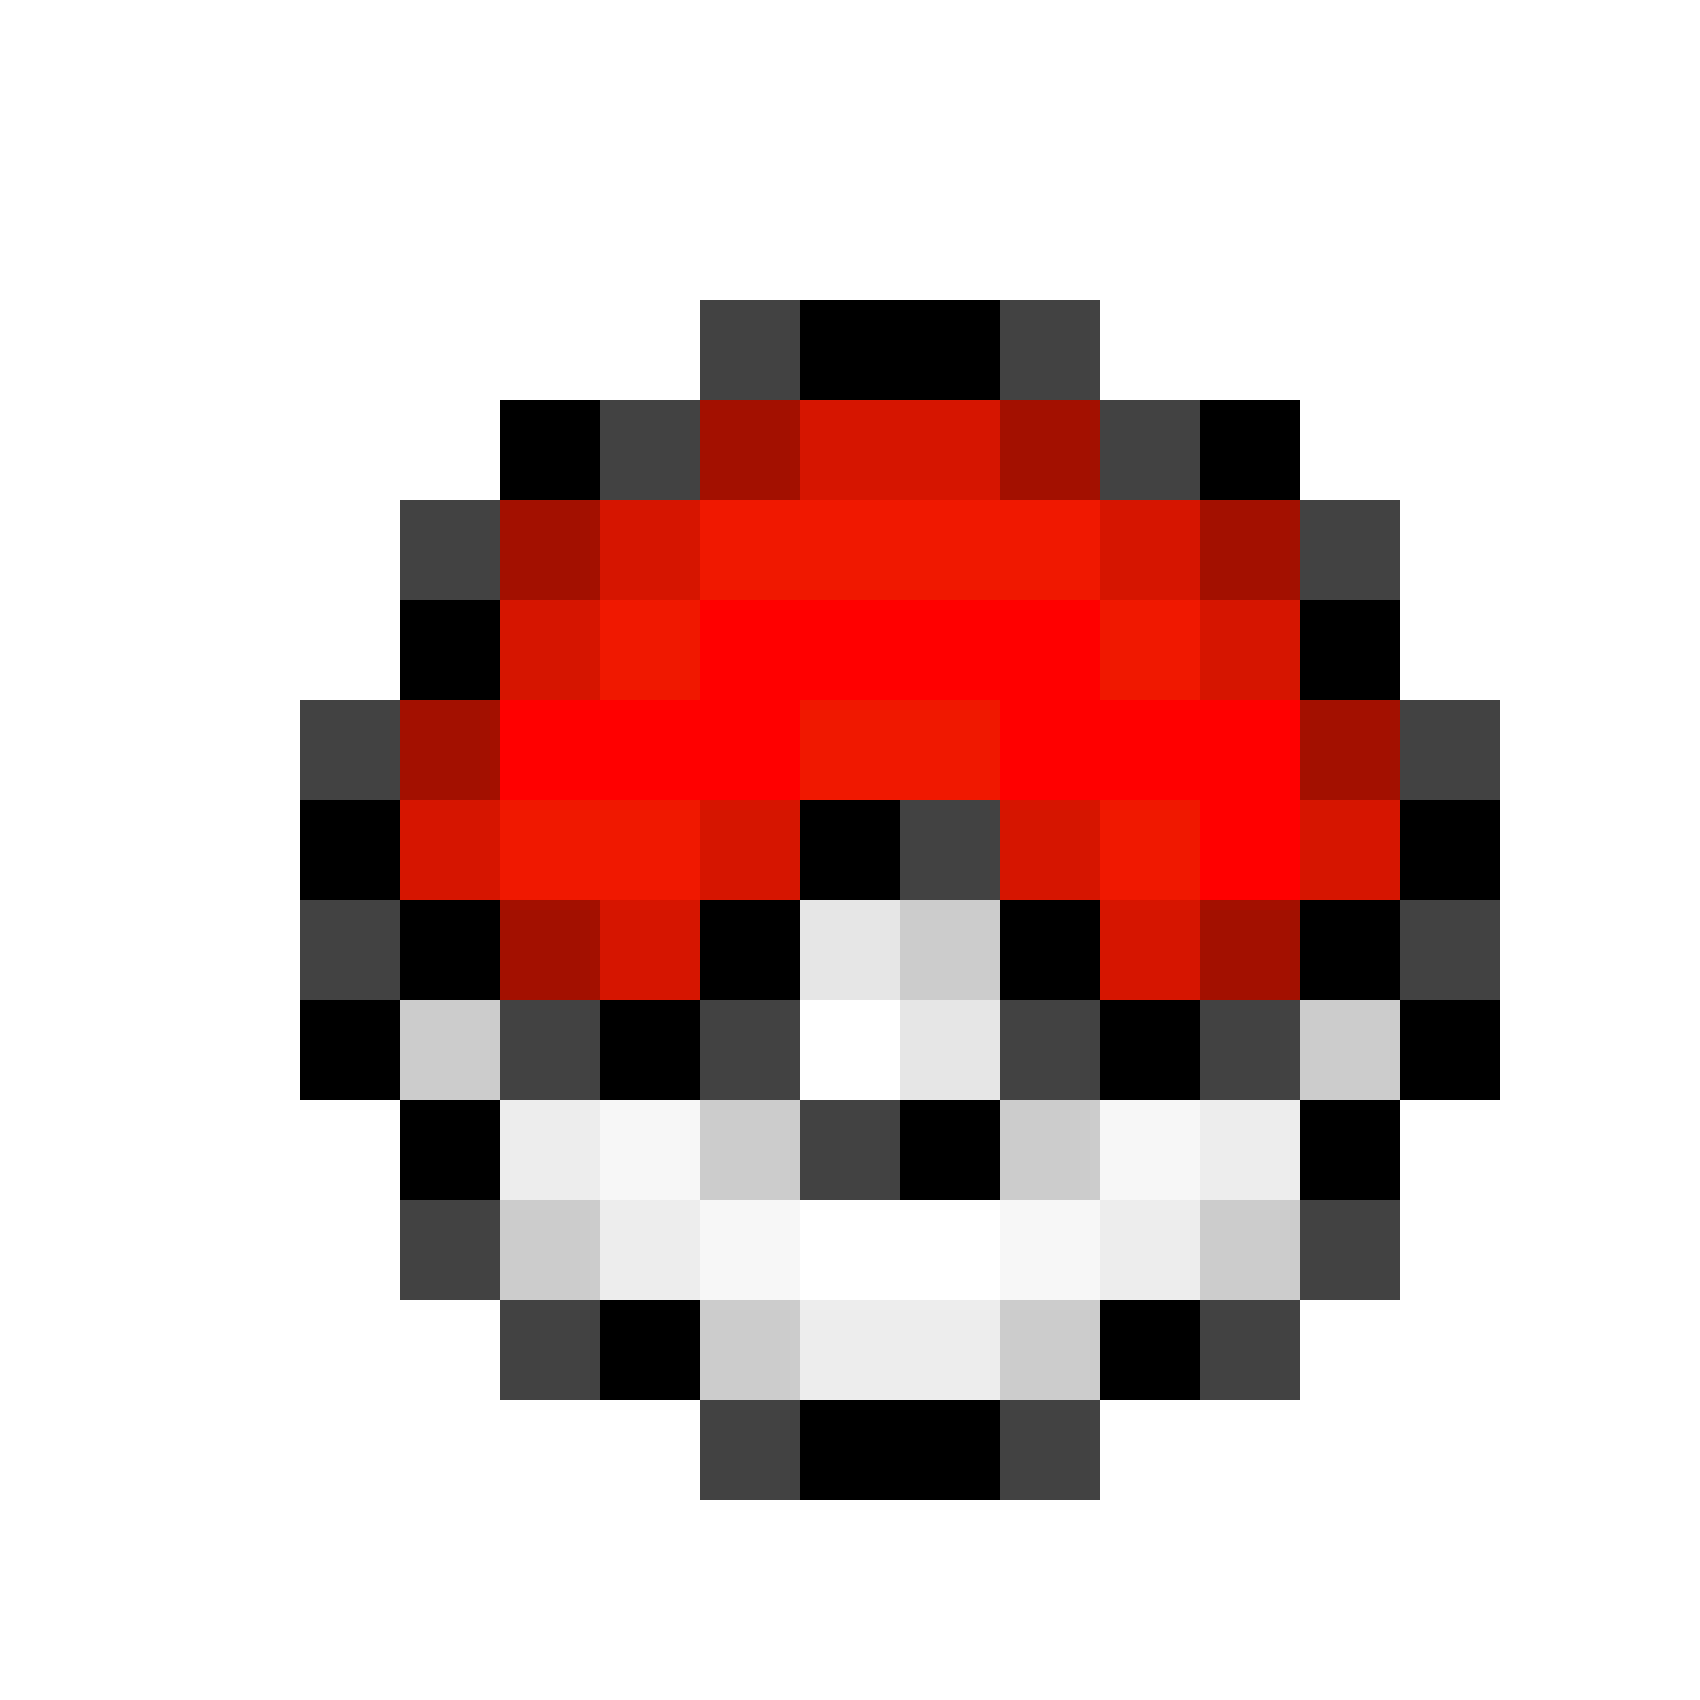 pokemon pokeball pixel art images pokemon images